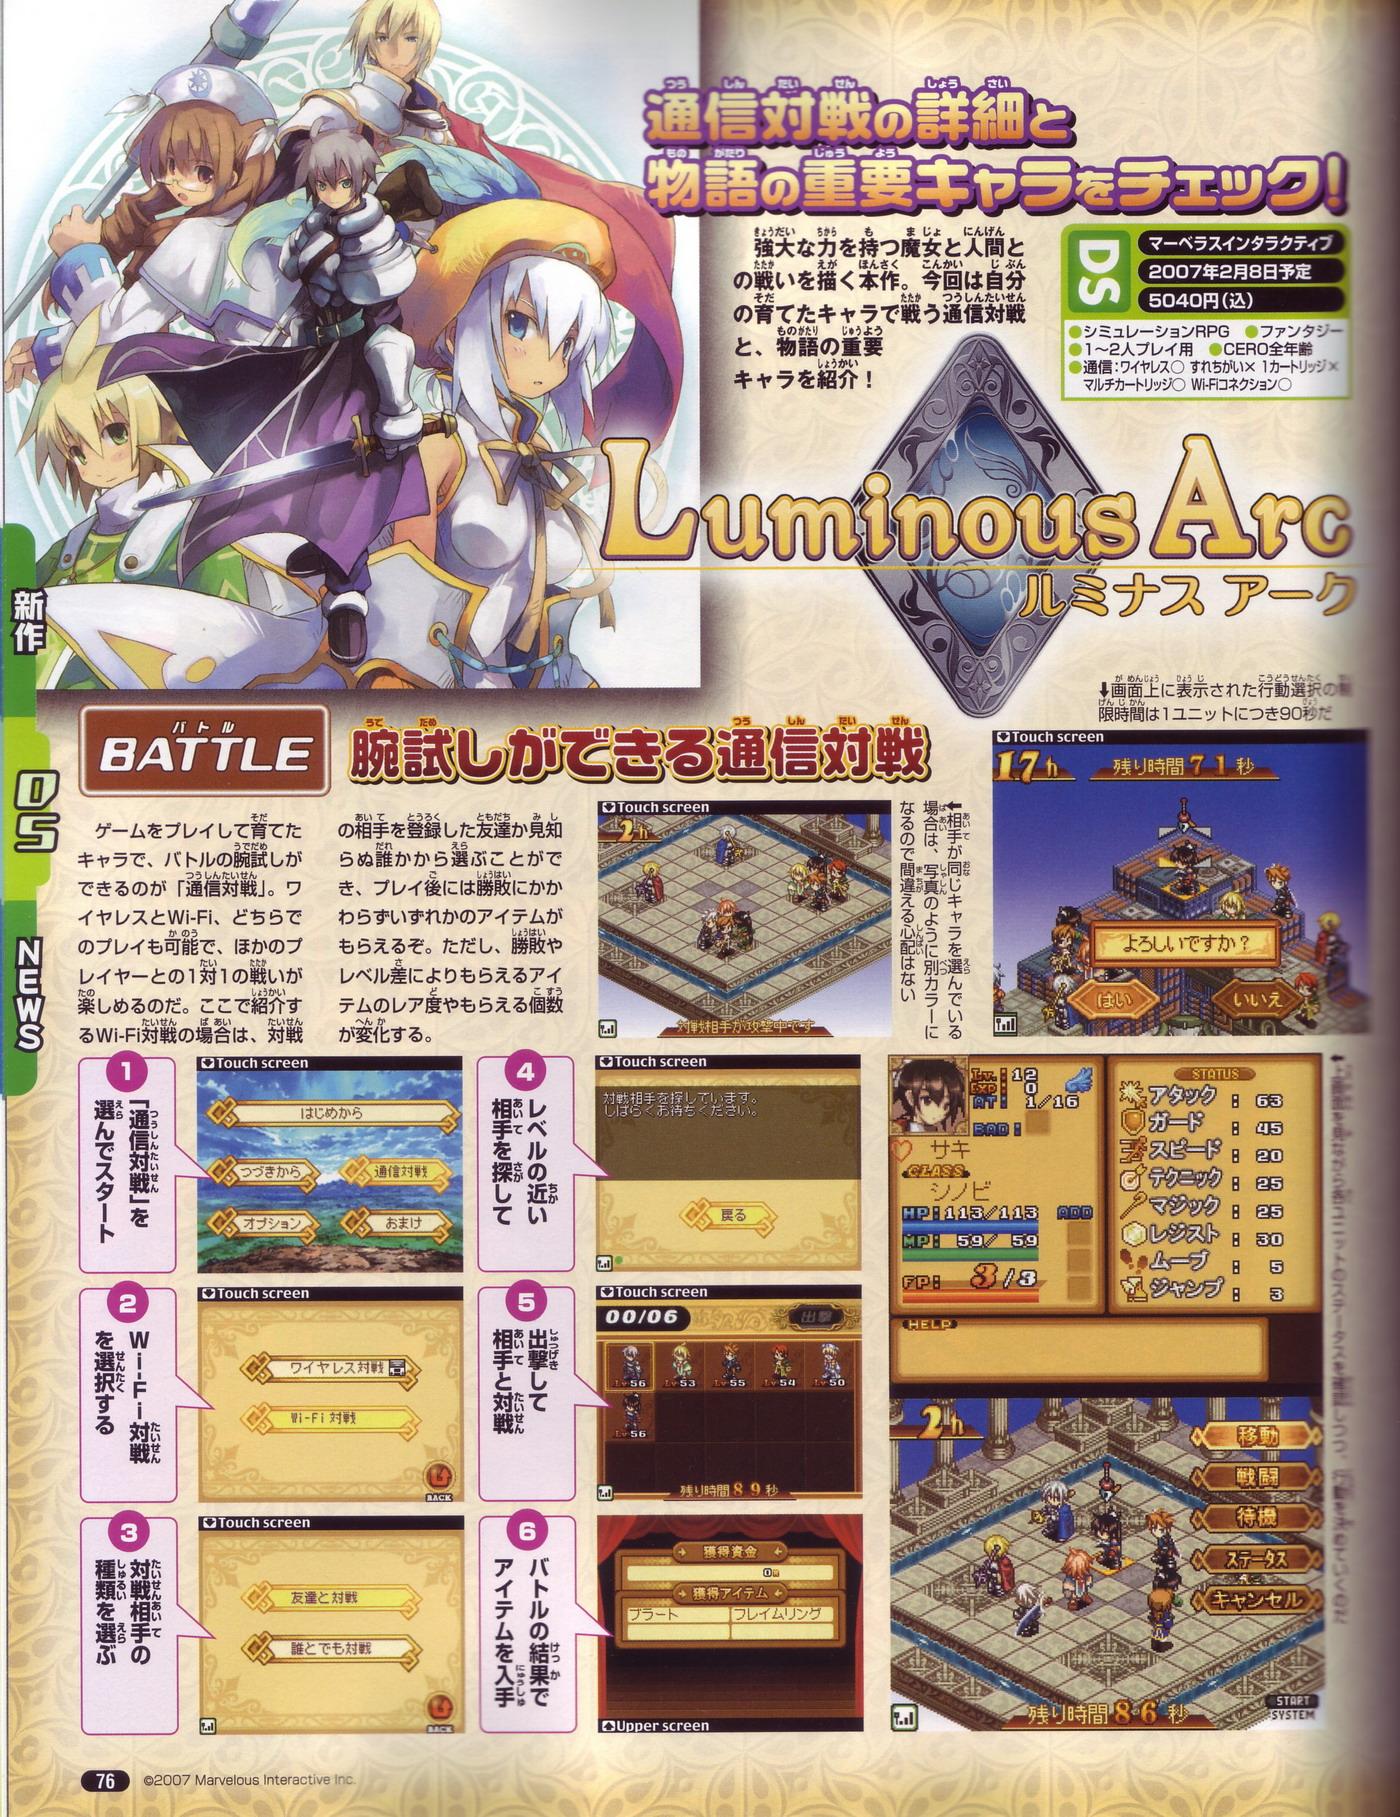 06519_Luminous_Arc_ND2007_02arr_122_529lo.jpg